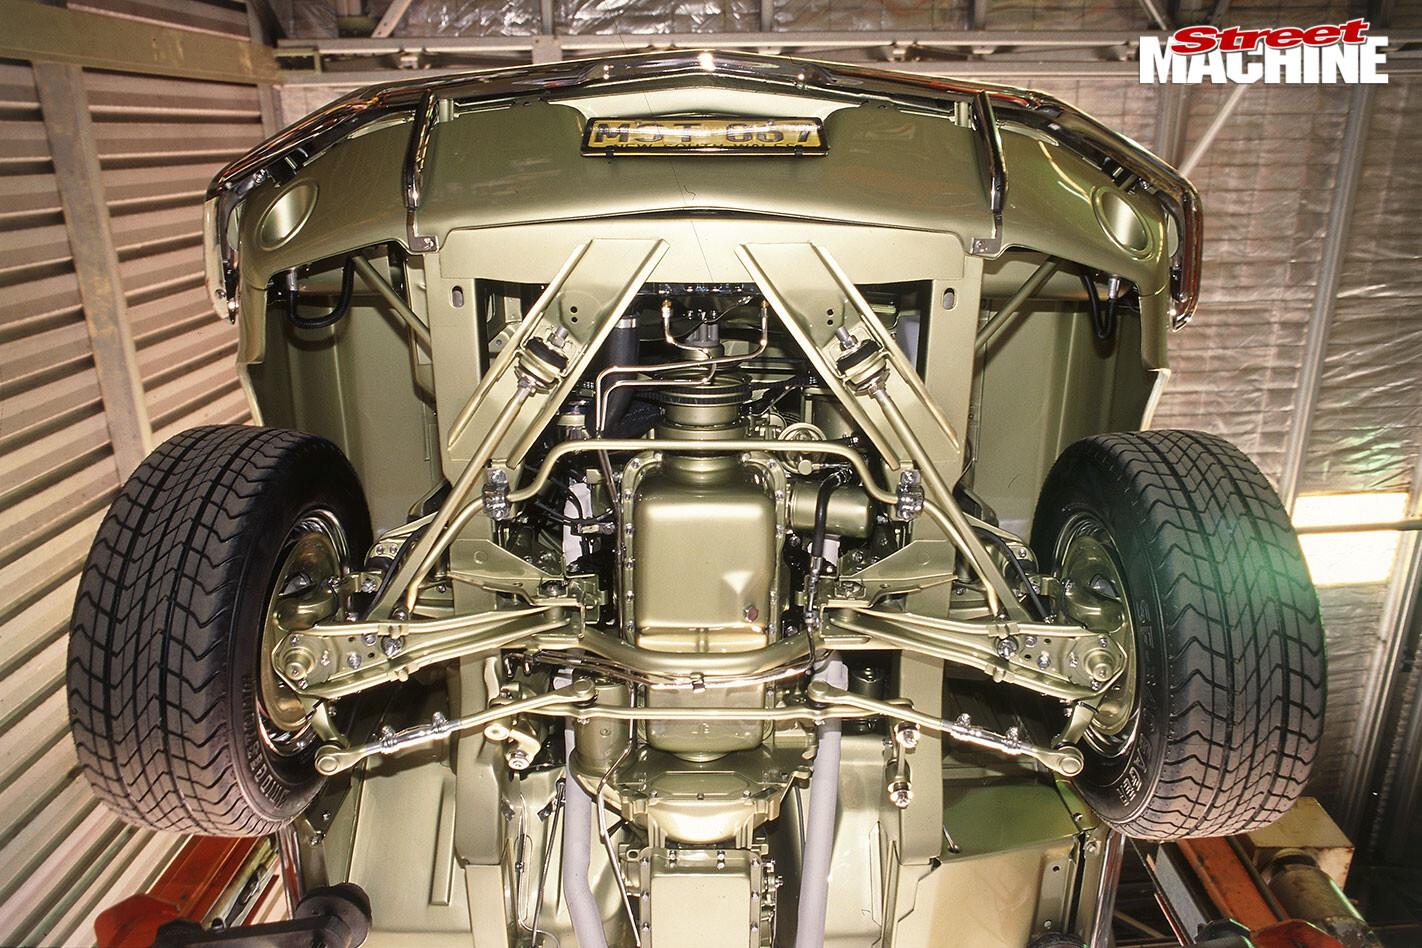 Ford Mustang underside